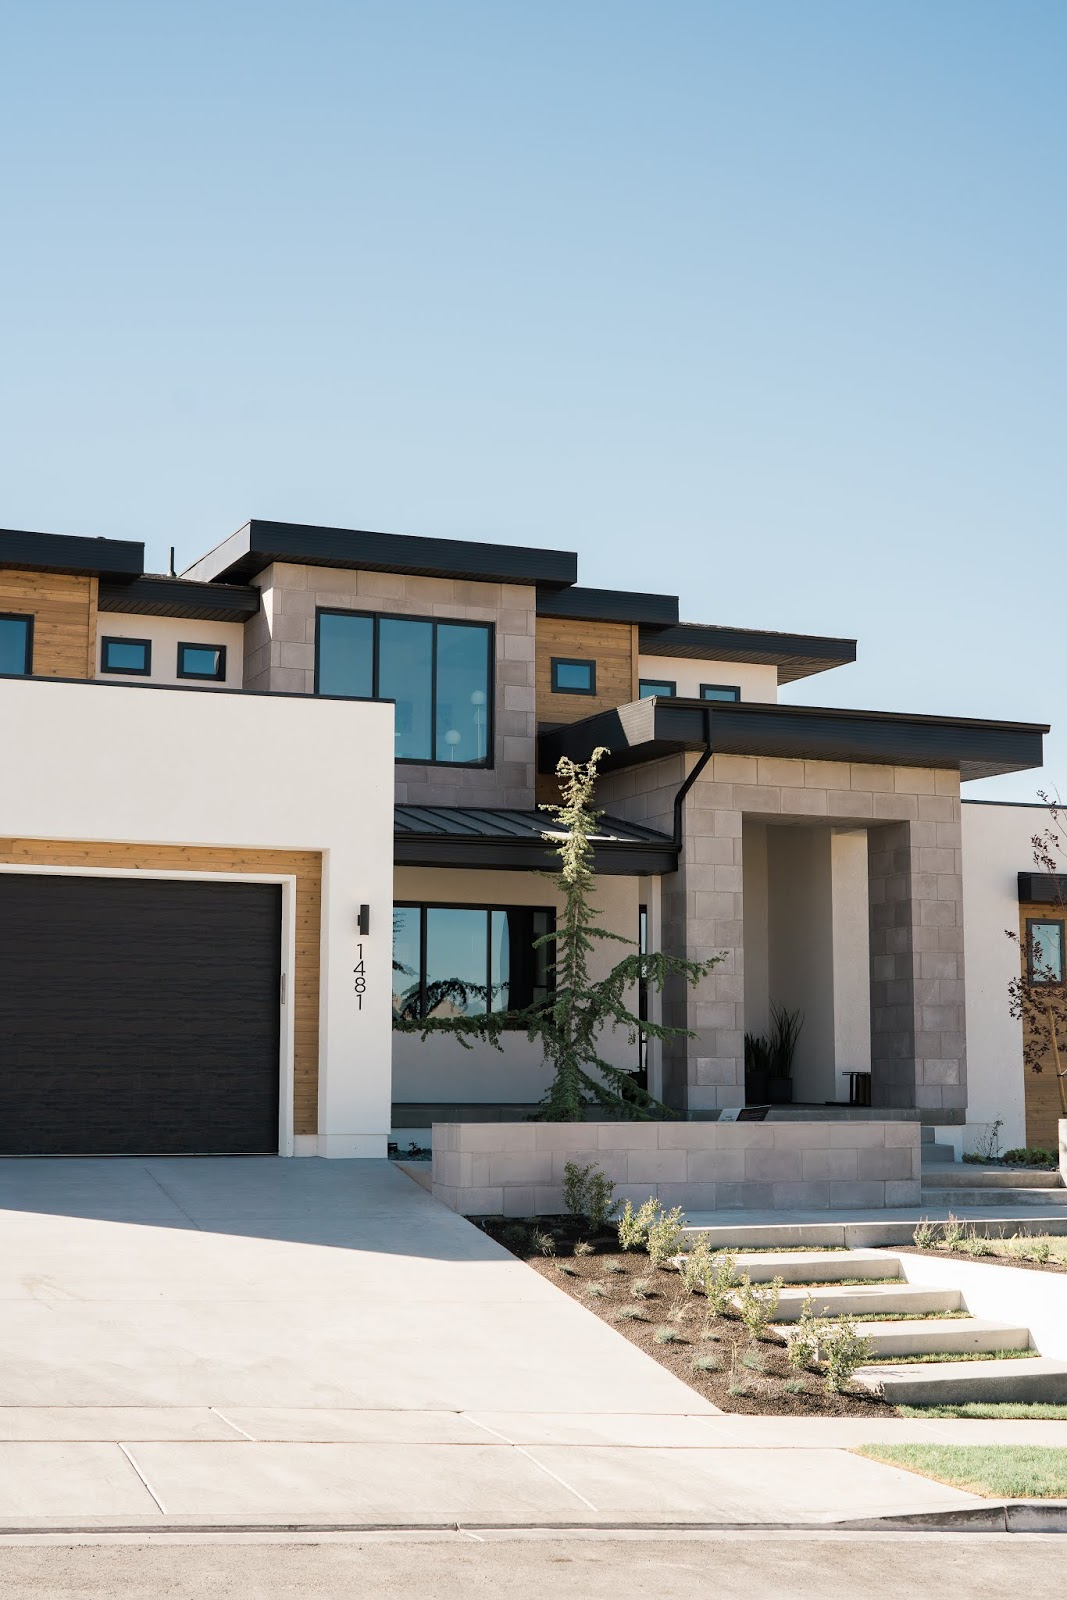 Modern Home, Industrial Home, Modern Utah Home